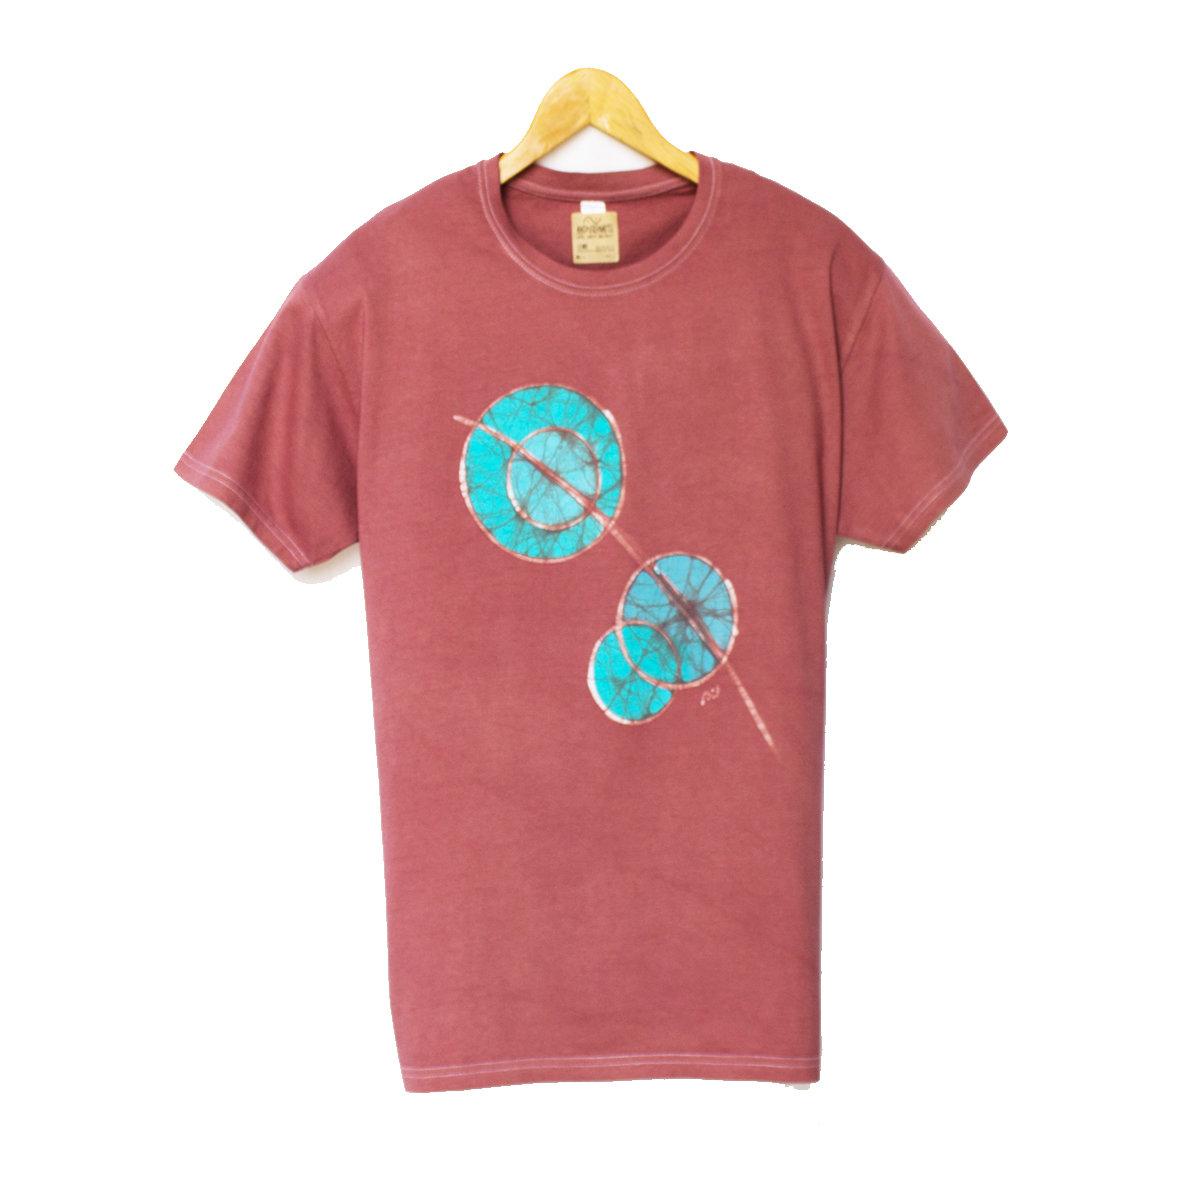 Camiseta abstracto/ T-Shirt Abstract